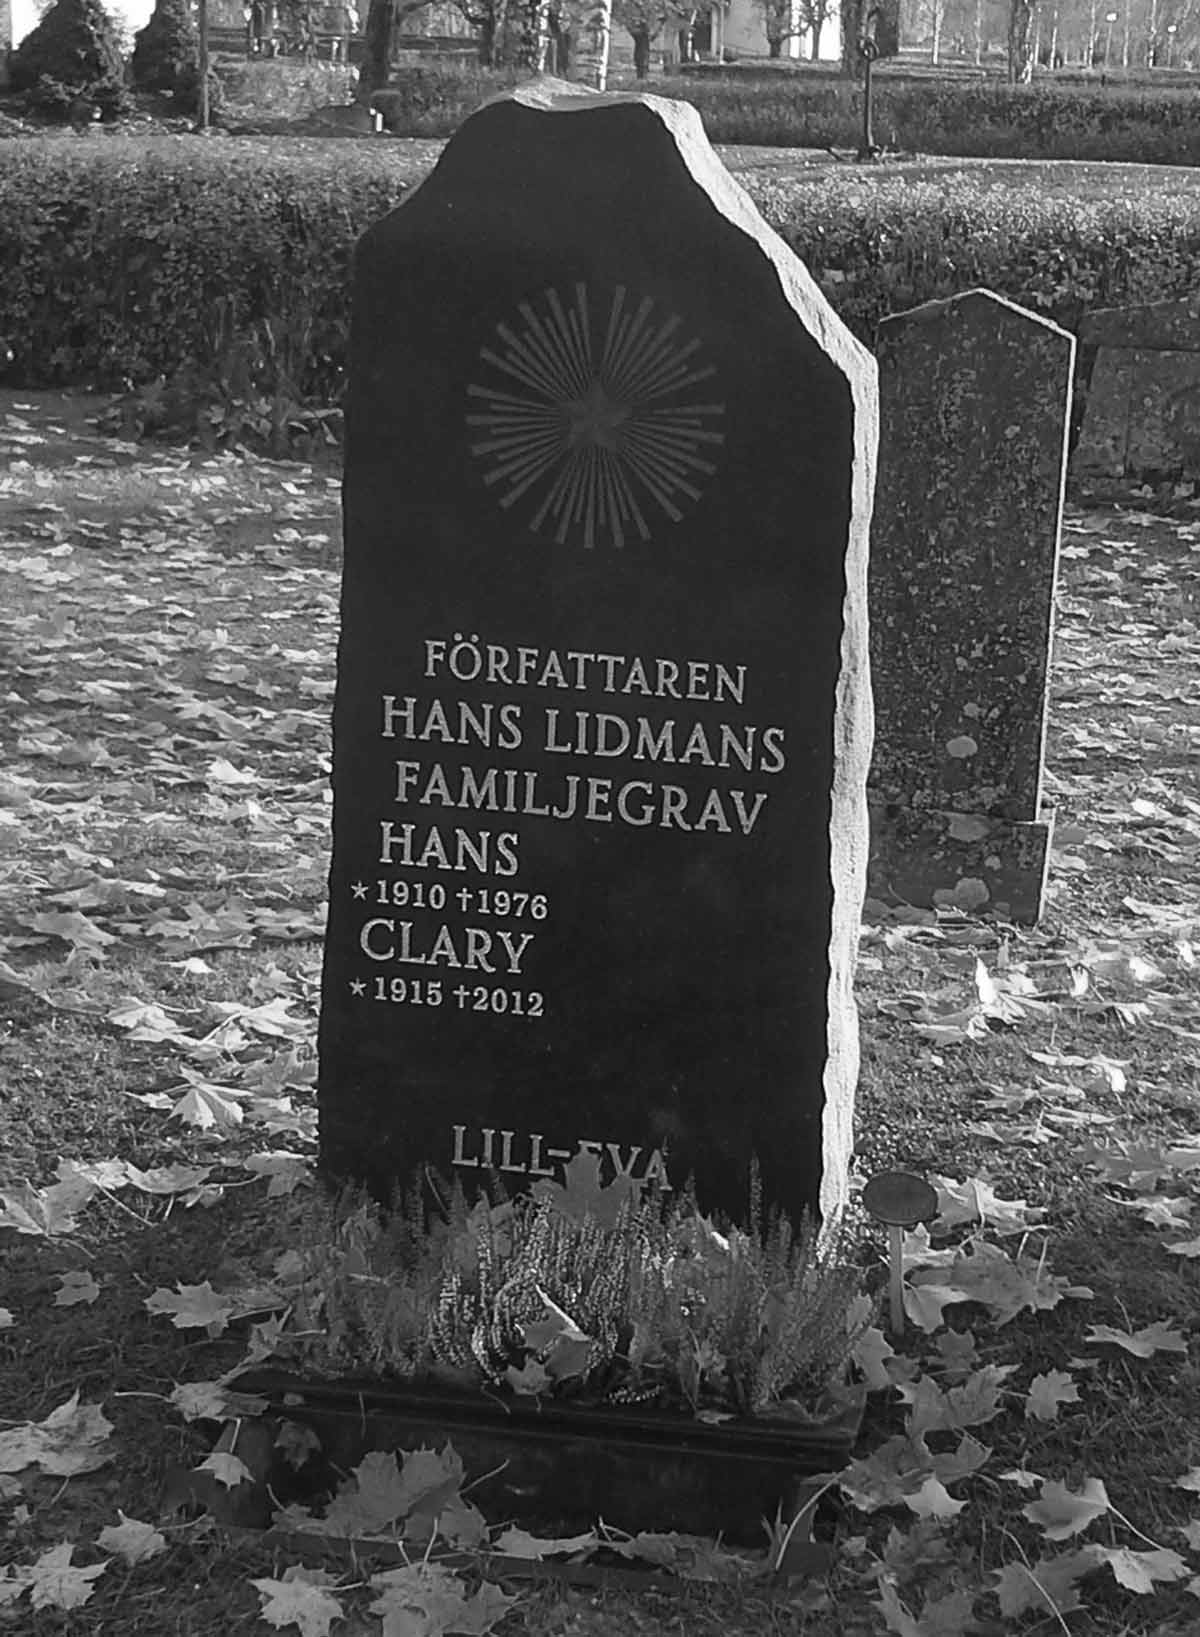 Hans Lidmans grav